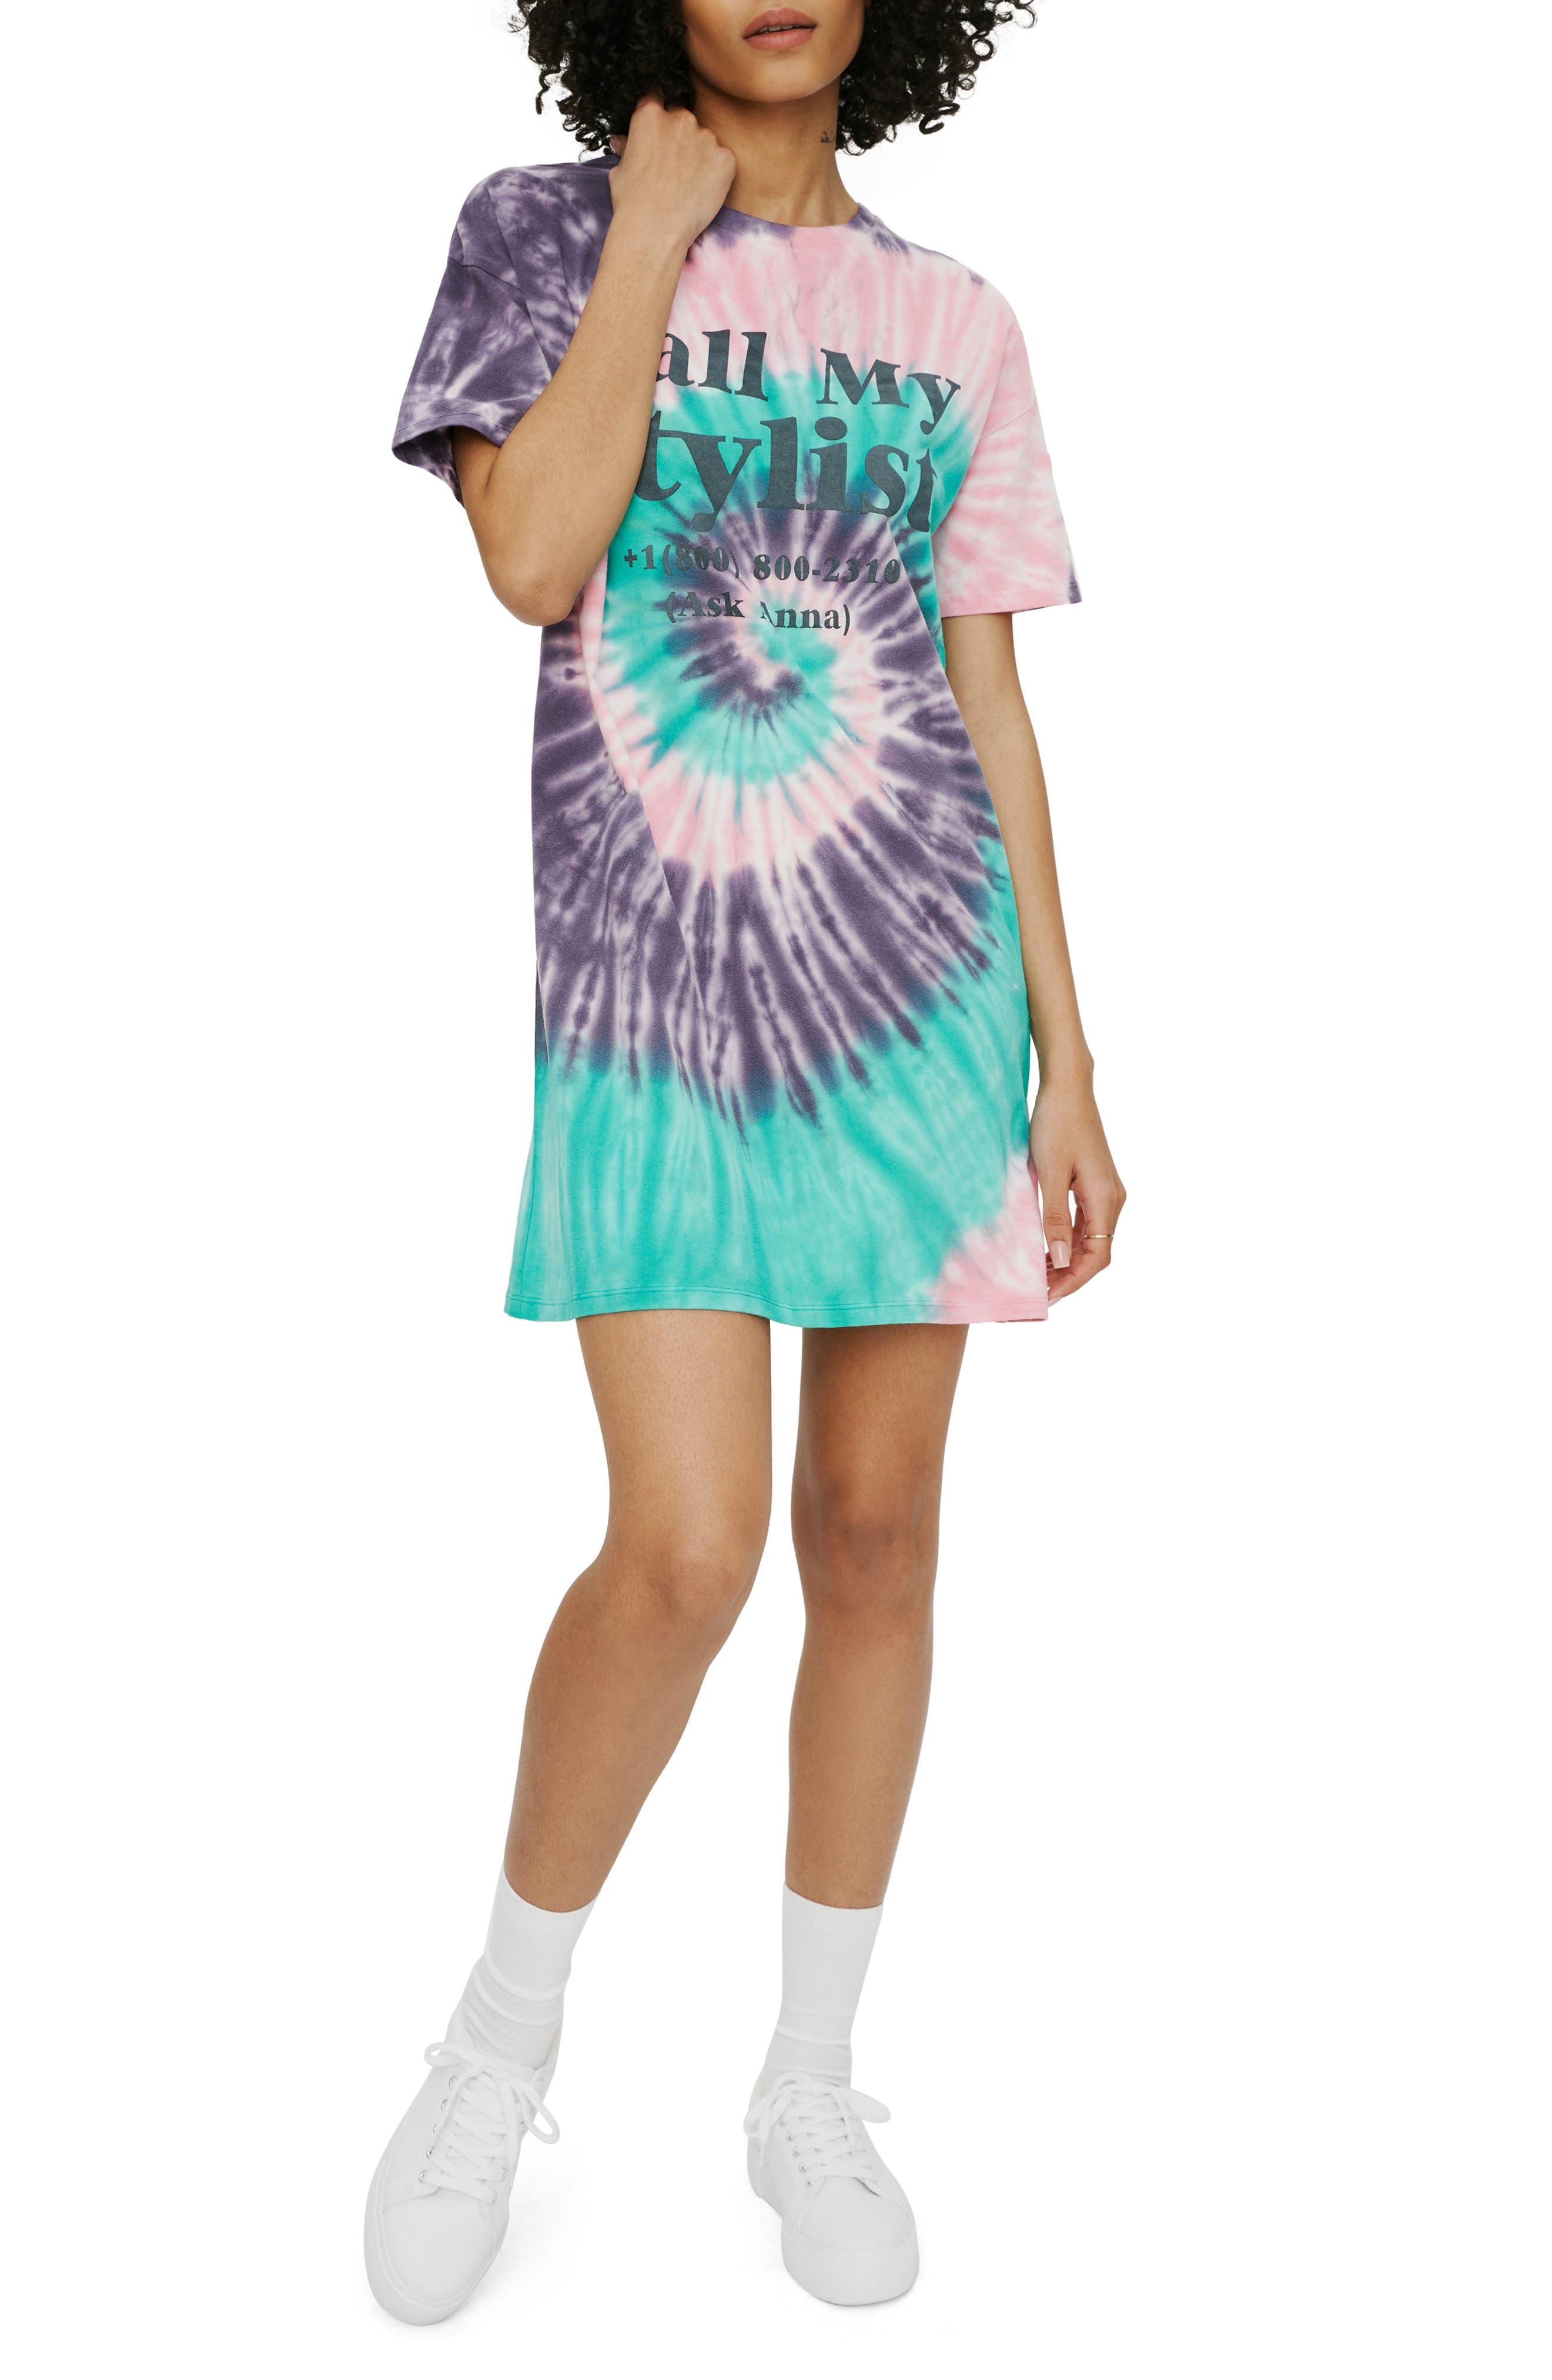 Call My Stylist Tie Dye Graphic T-Shirt Dress